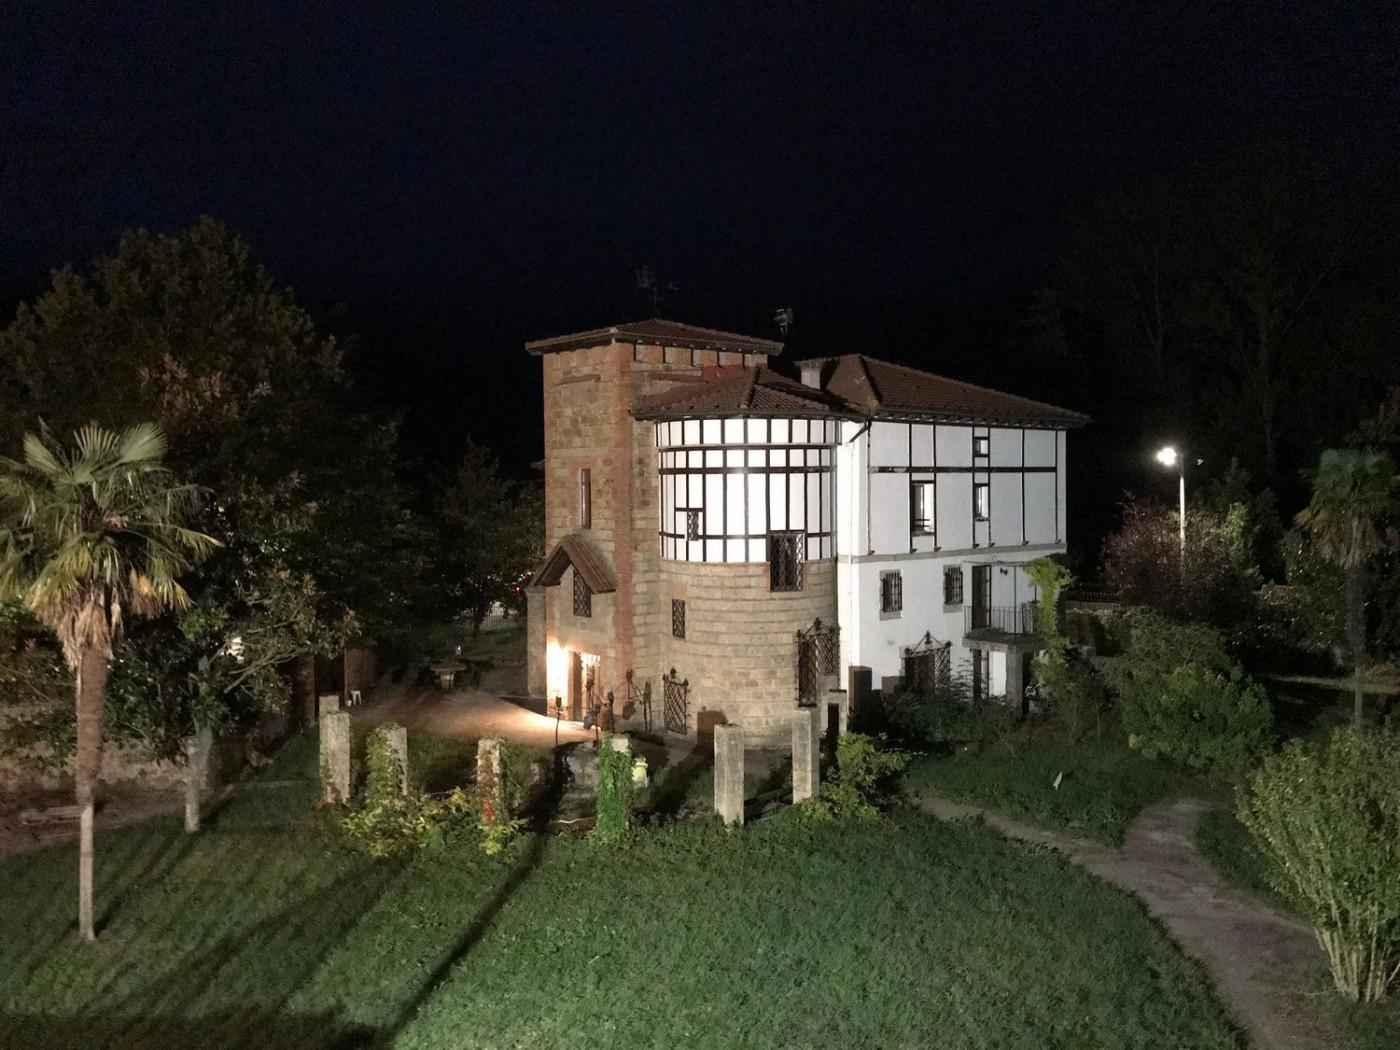 House for sale in Valle de Mena, Valle de Mena